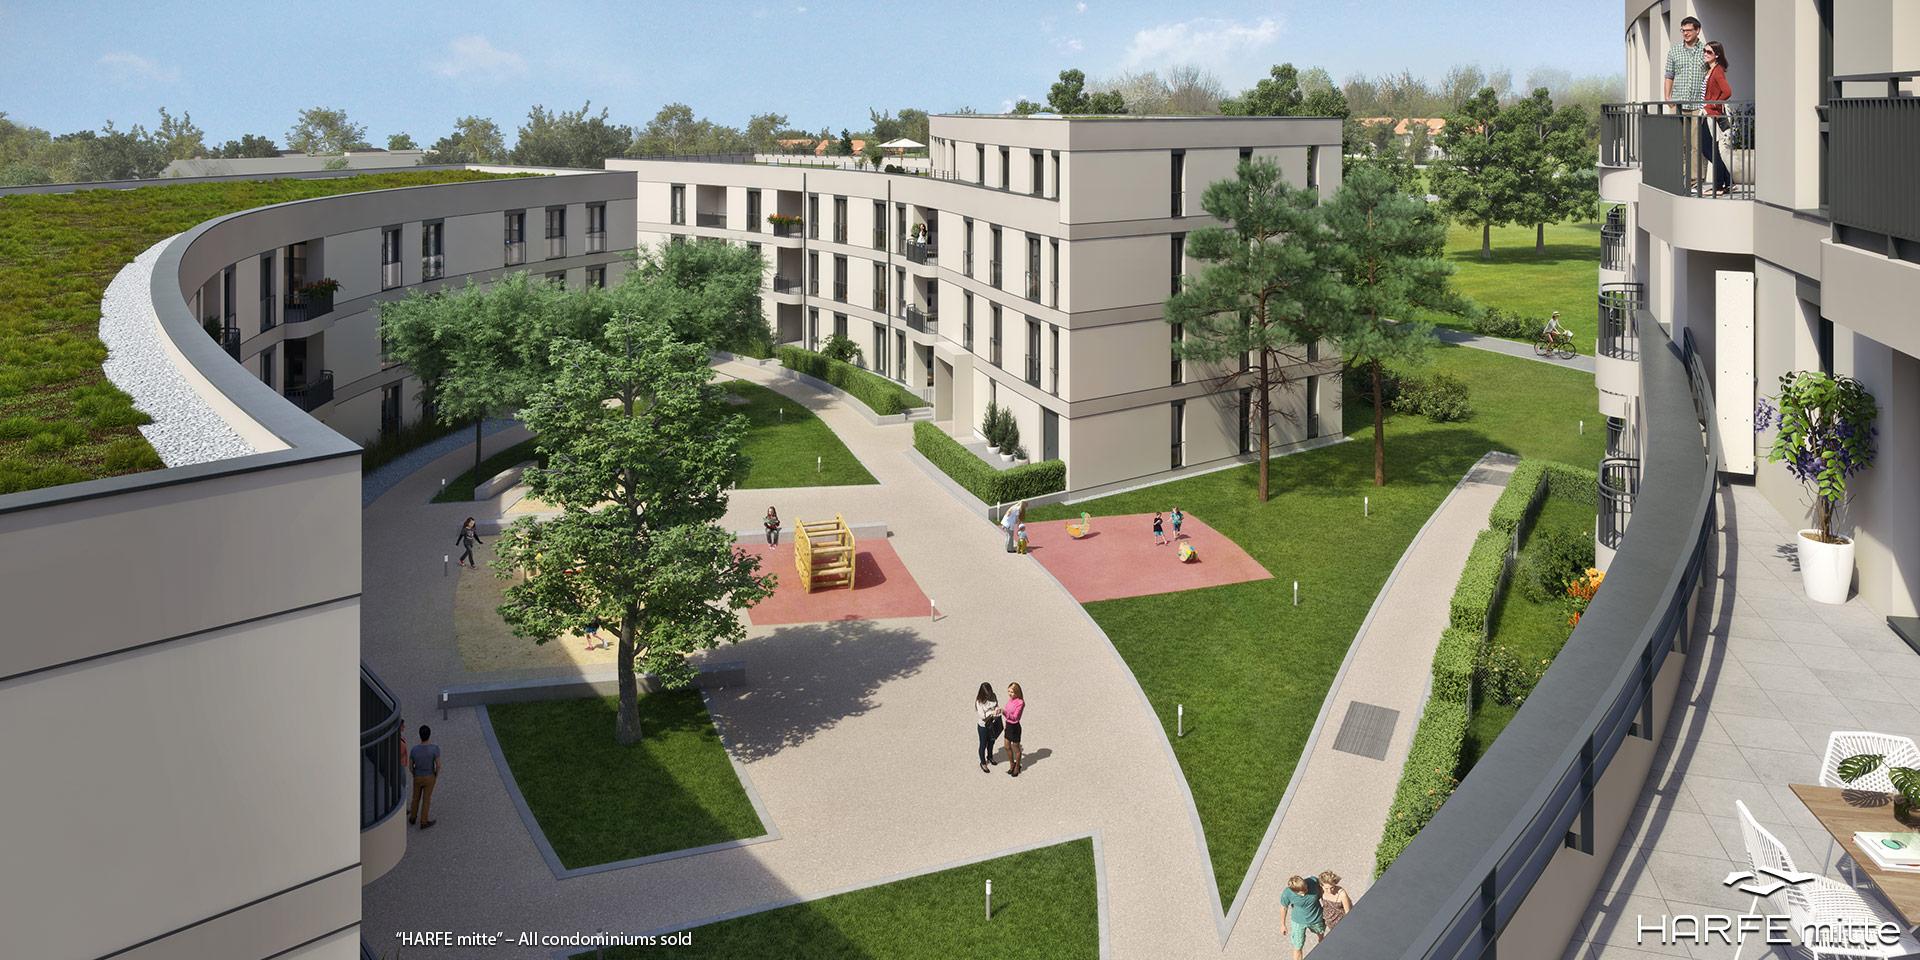 'HARFE mitte' in Munich-Neuaubing: All condominiums sold